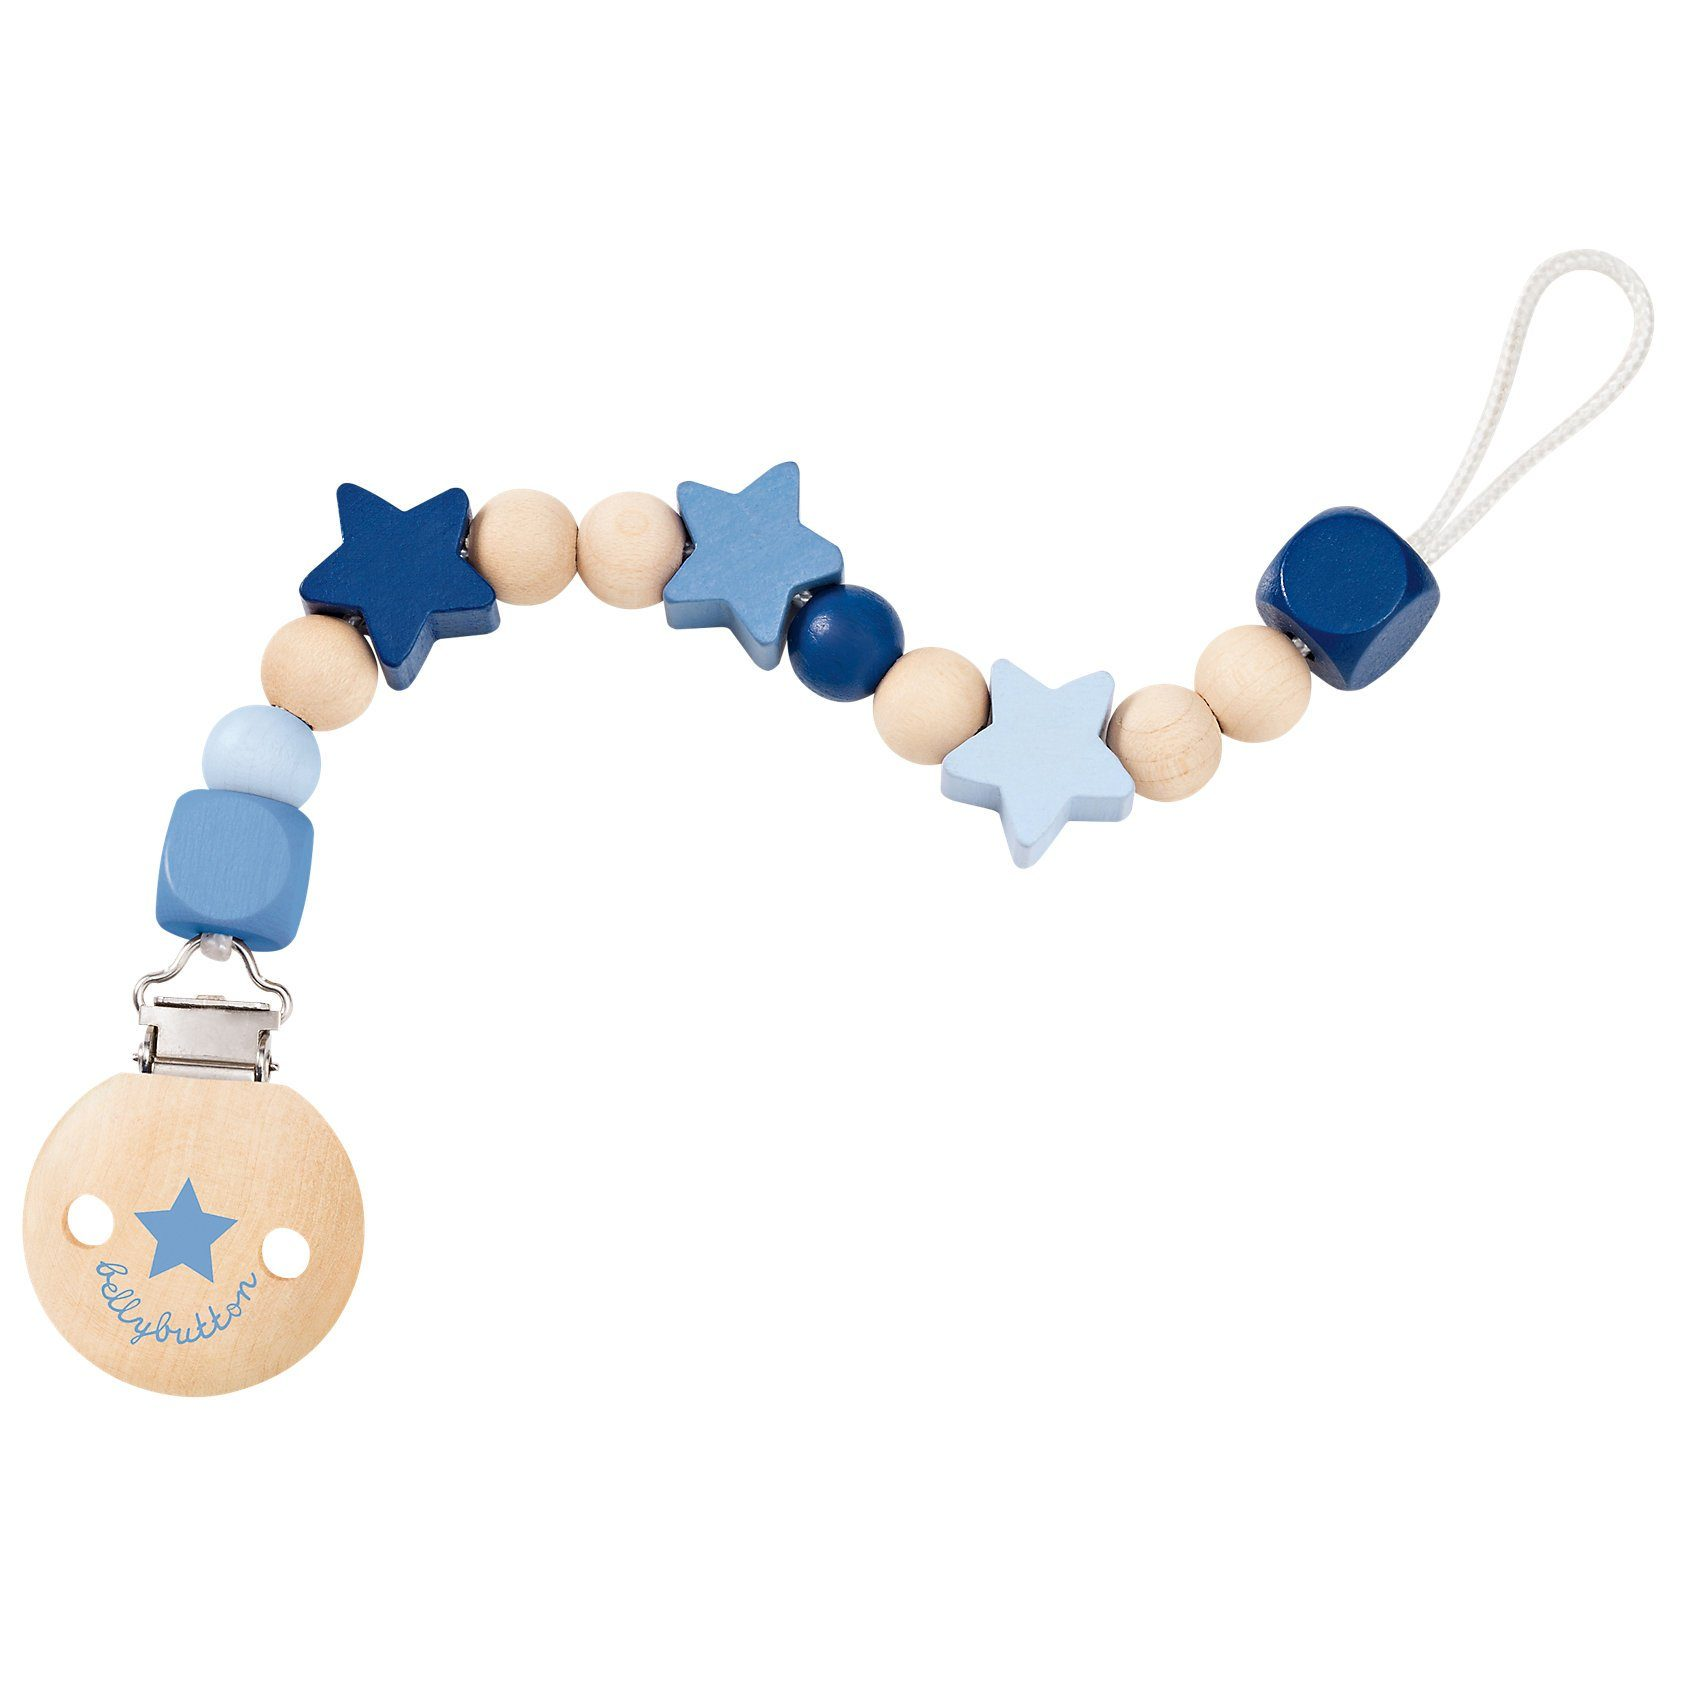 Selecta Sternchenglück Schnullerkette bellybutton, blau